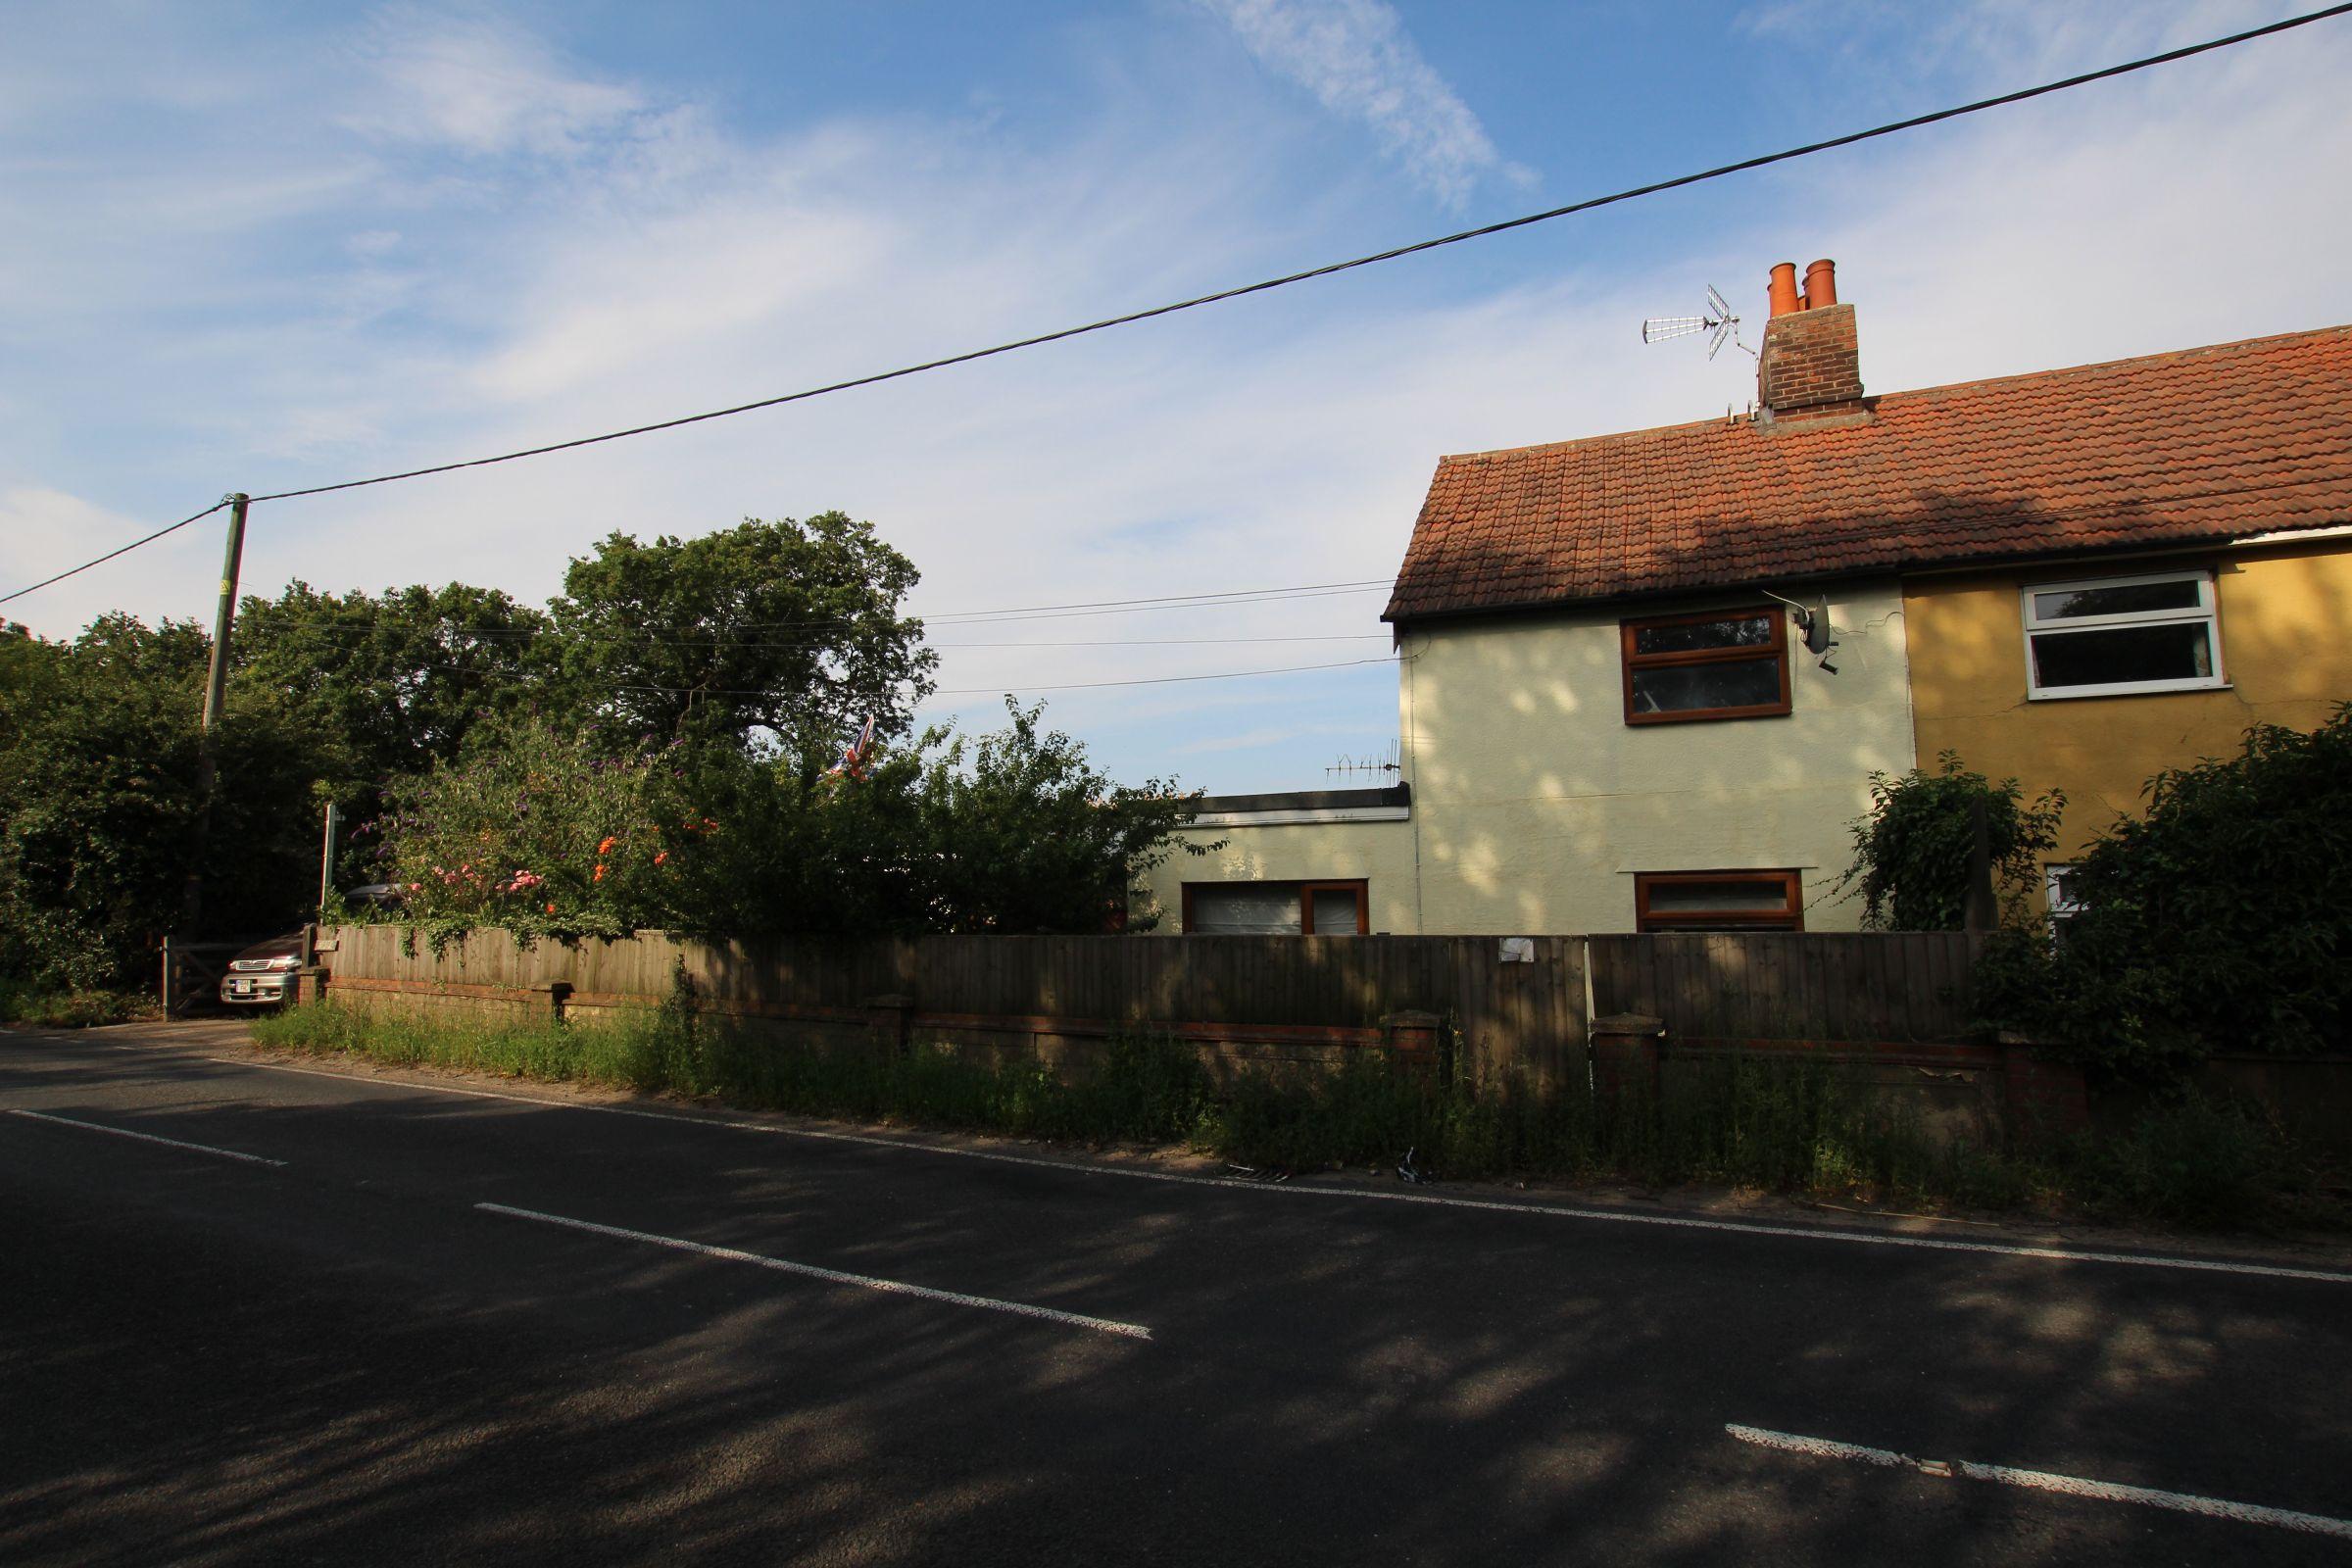 Colchester Main Road, Alresford, Colchester